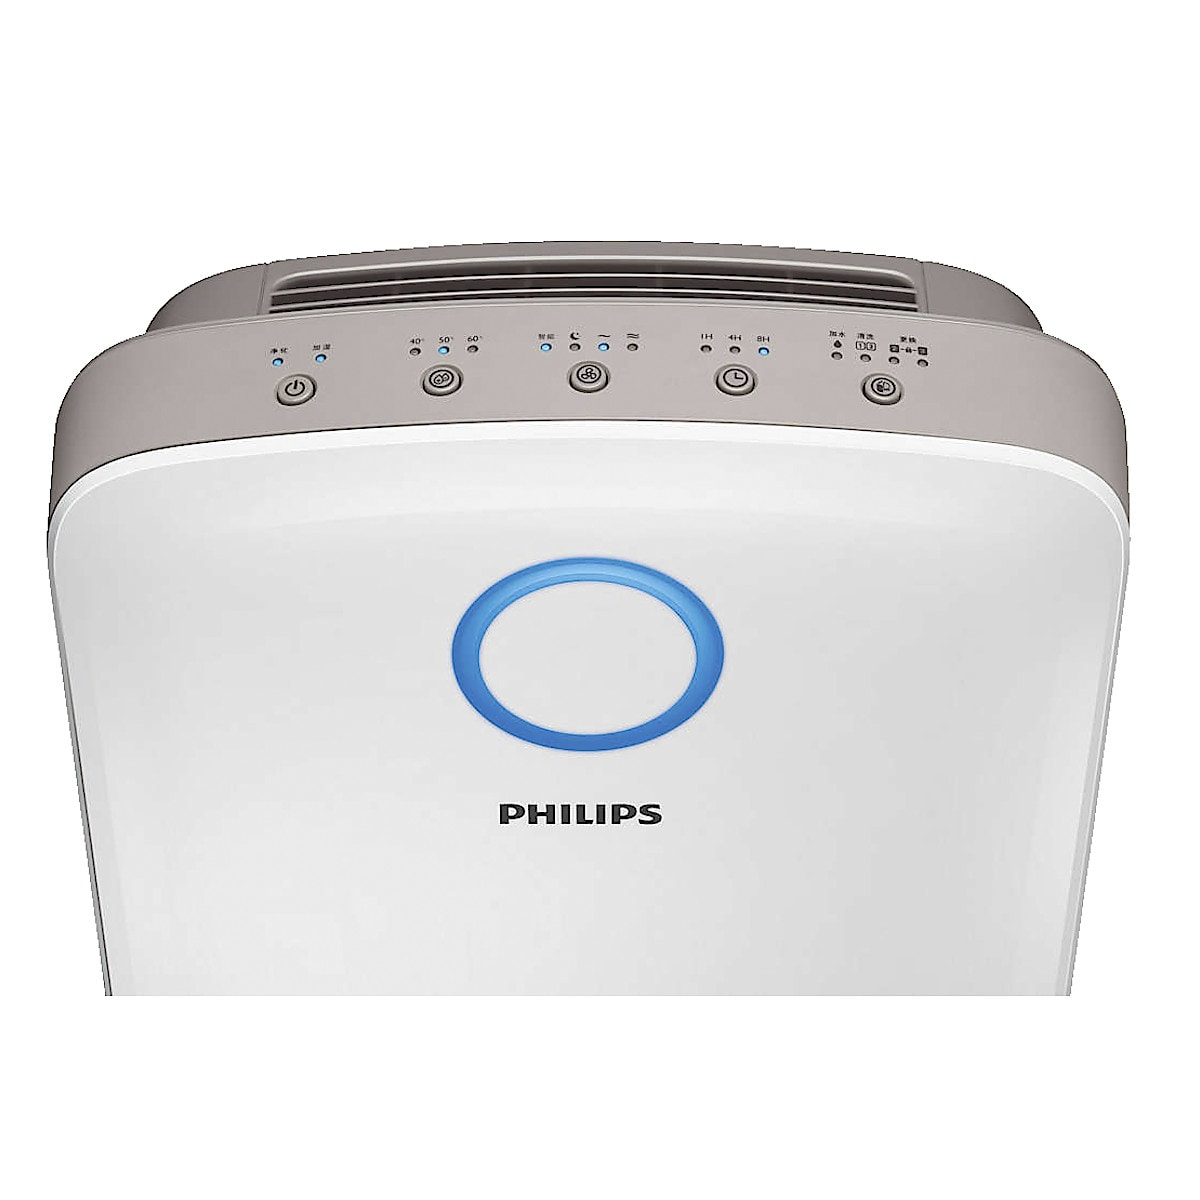 Luftrenare/luftfuktare Philips Air Combi AC4080/10